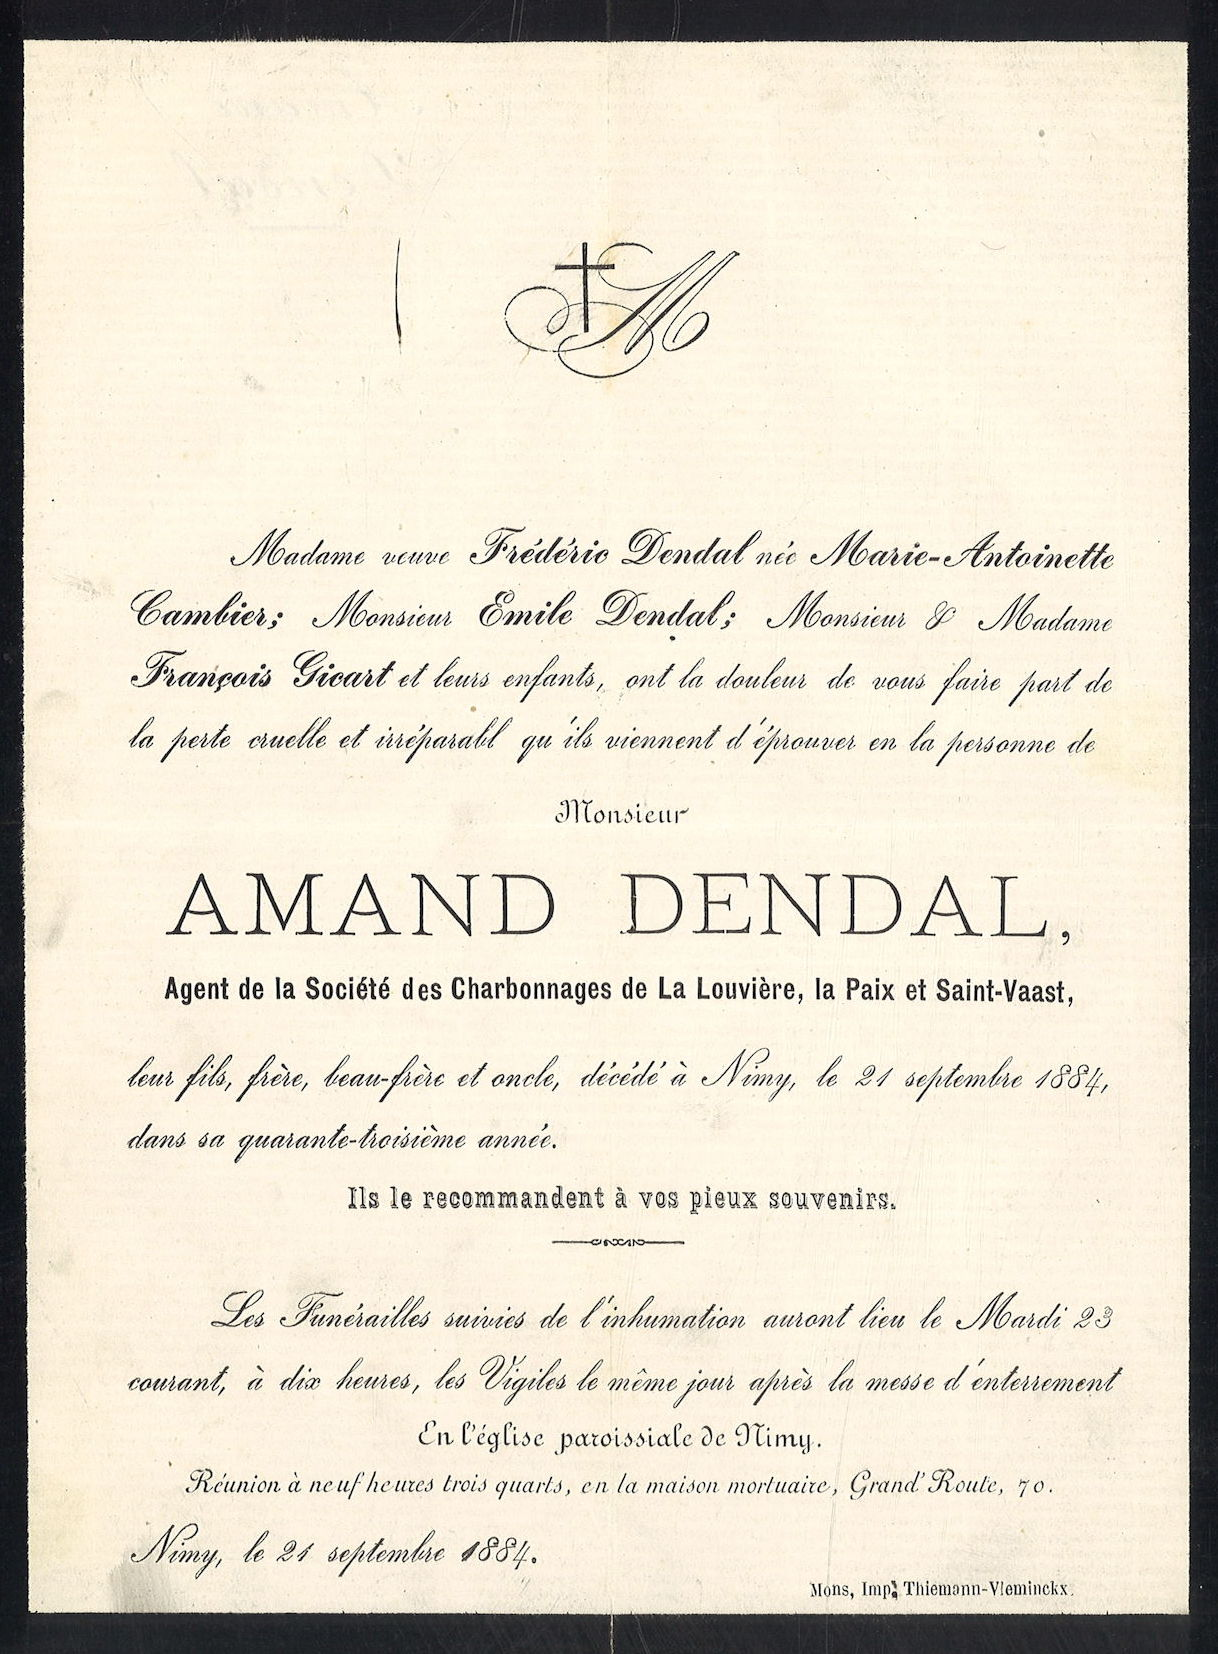 Amand Dendal